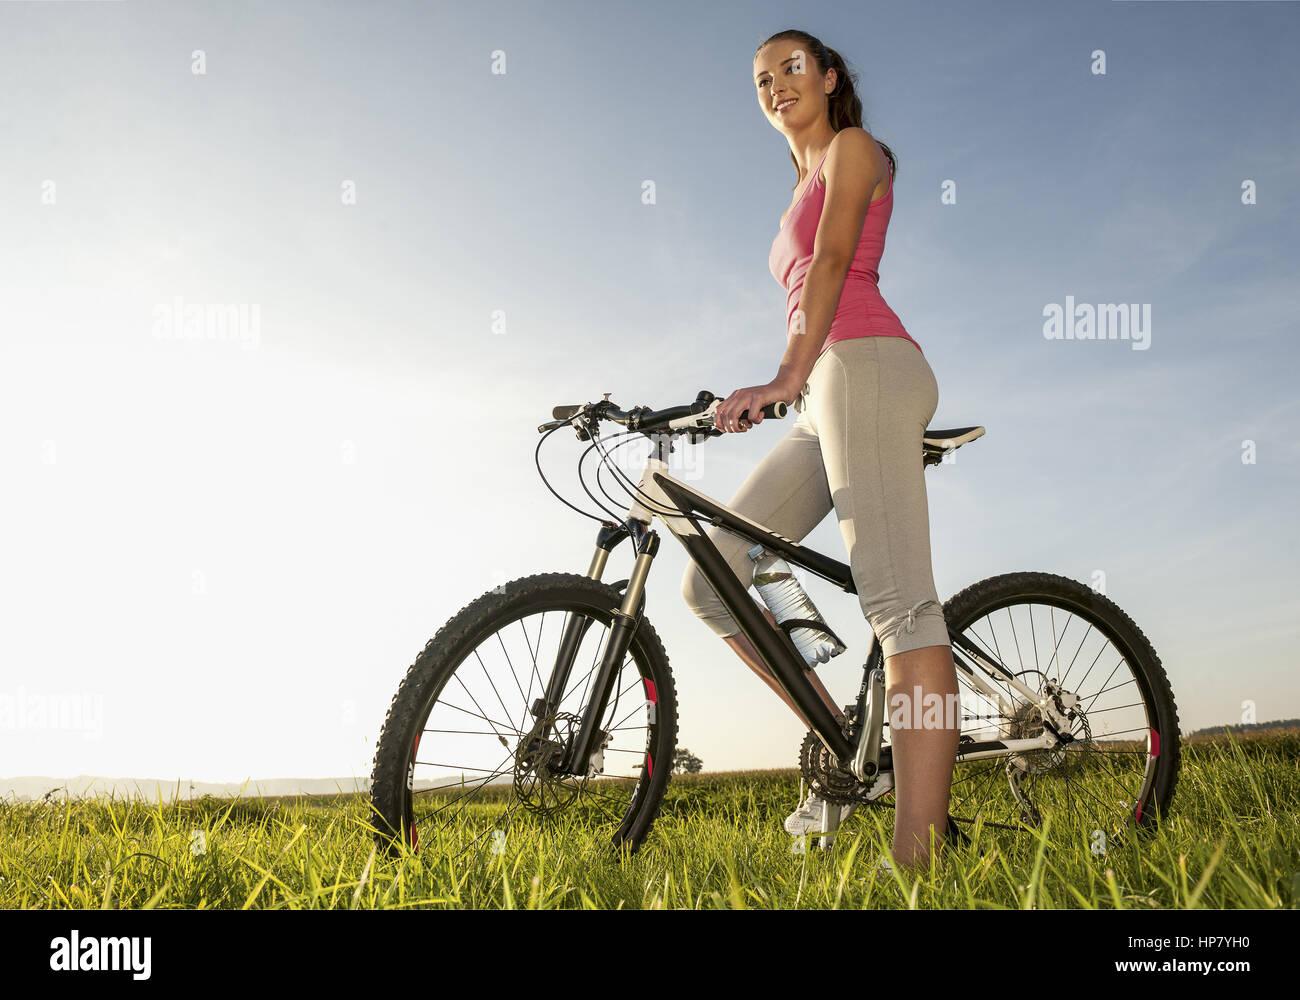 Junge Frau mit Fahrrad (modelo-liberado) Imagens de Stock